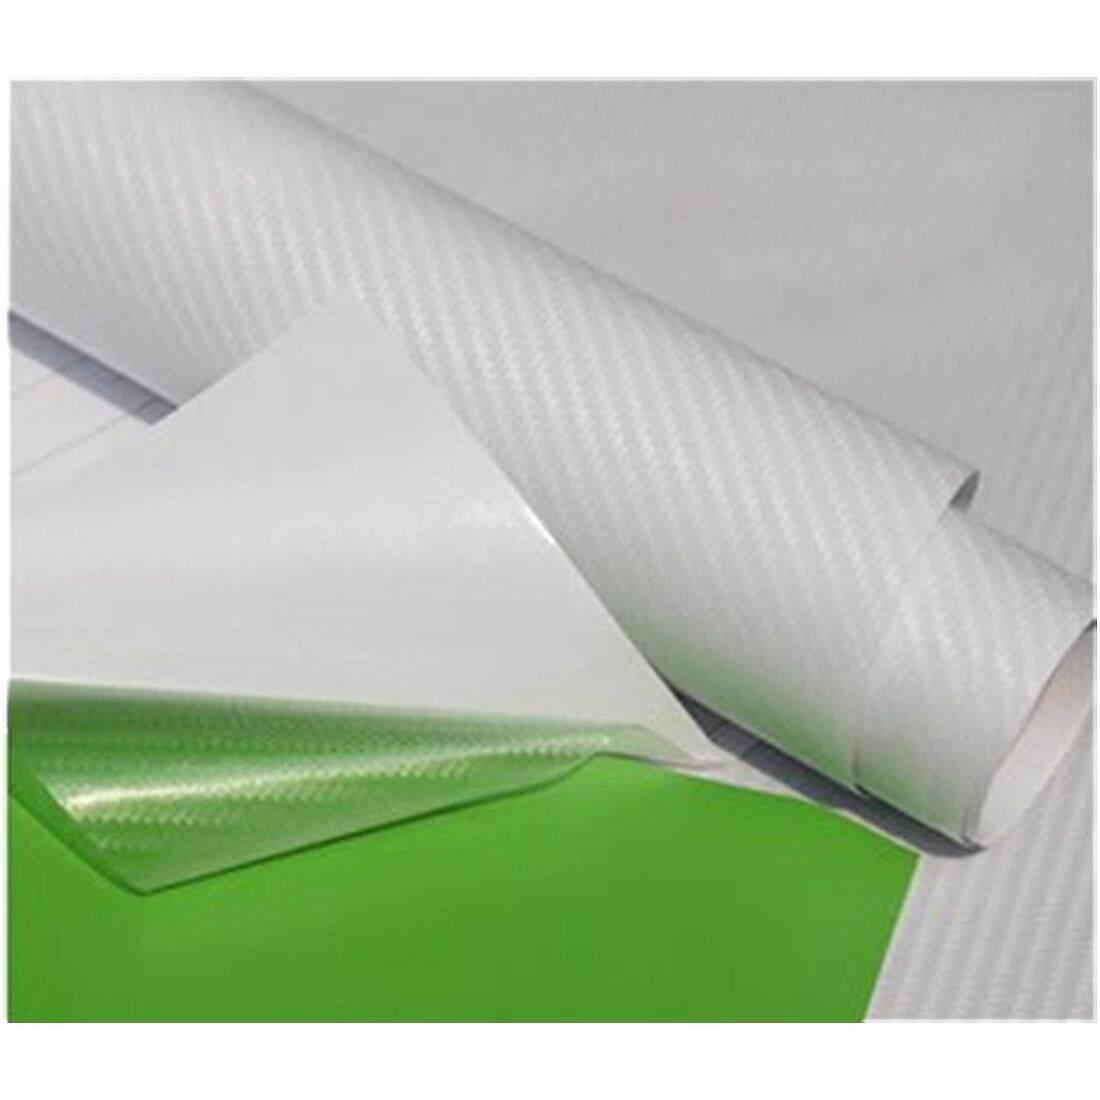 DIY 30x127 3D Carbon Fiber Decal Vinyl Film Wrap Roll Adhesive Car Sticker  Sheet Transparent